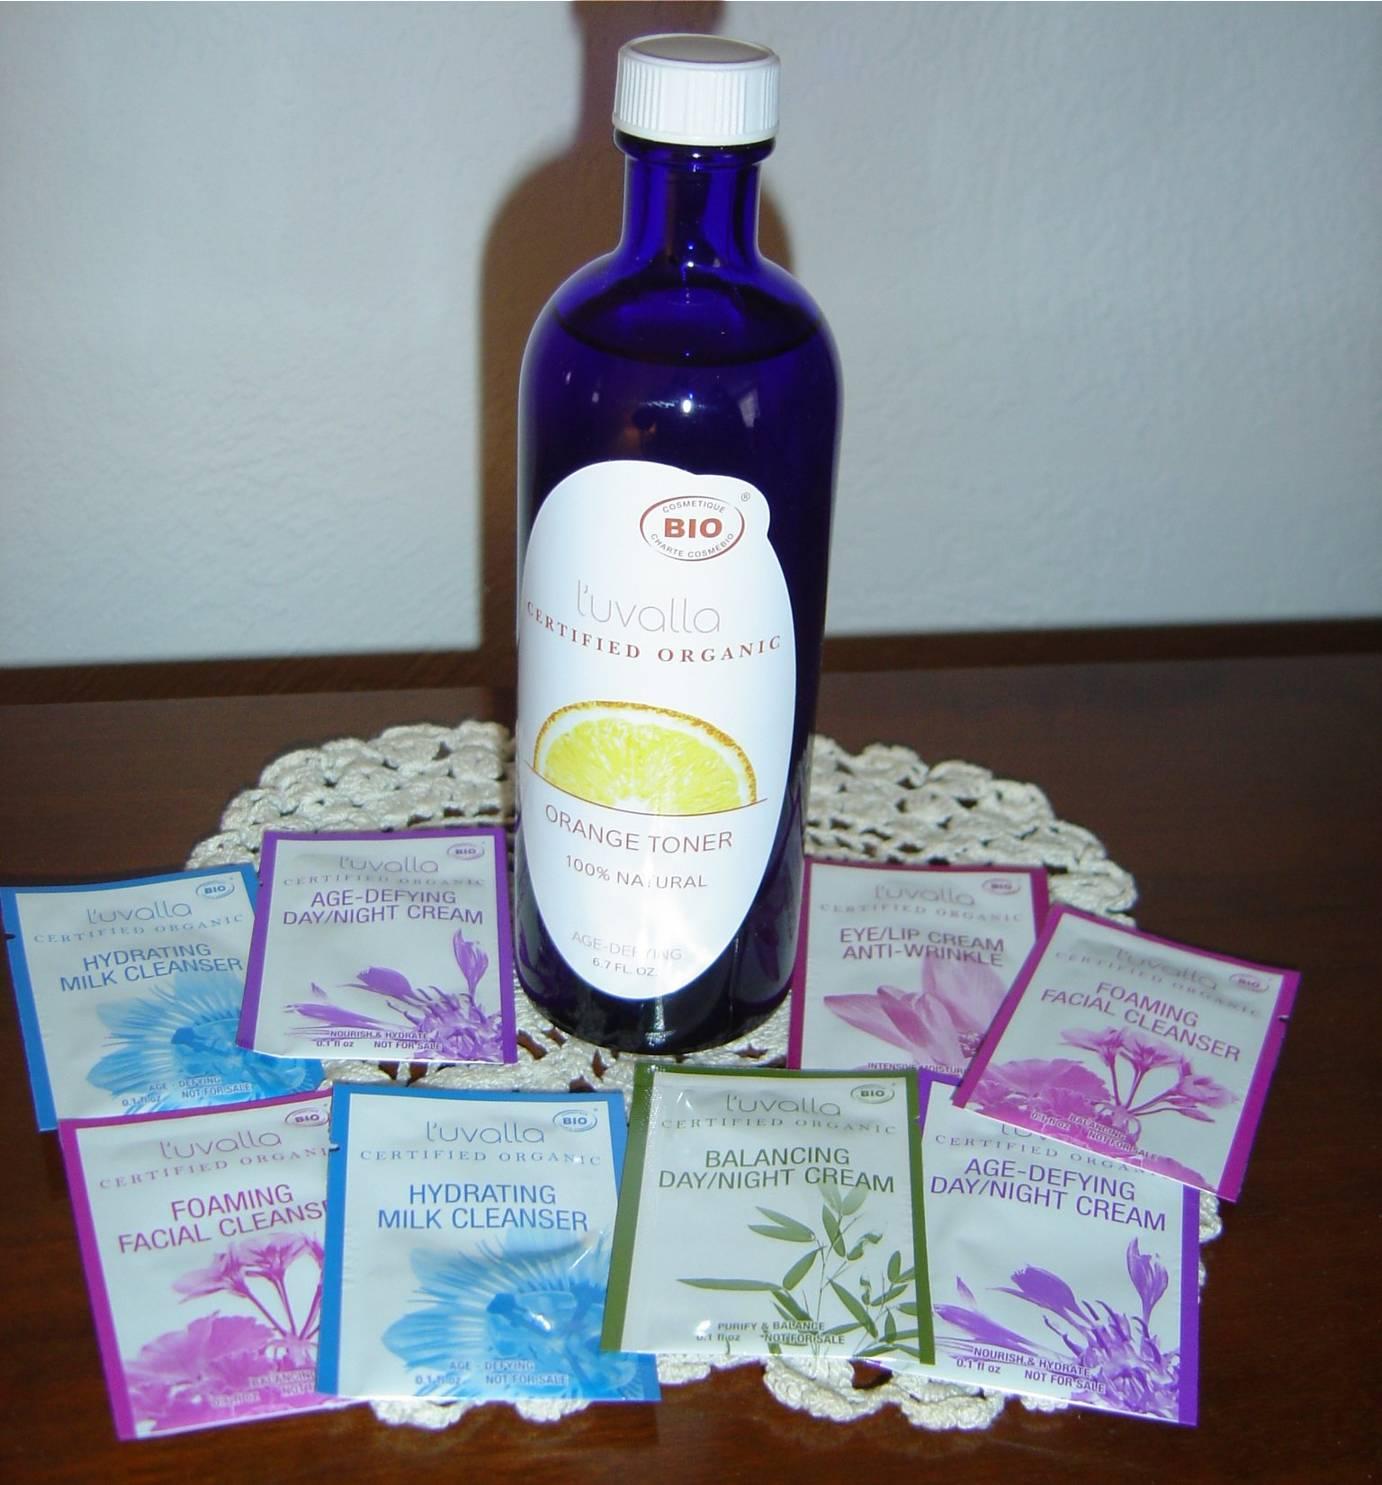 L'uvalla Certified Organic Skin Care toner and samples